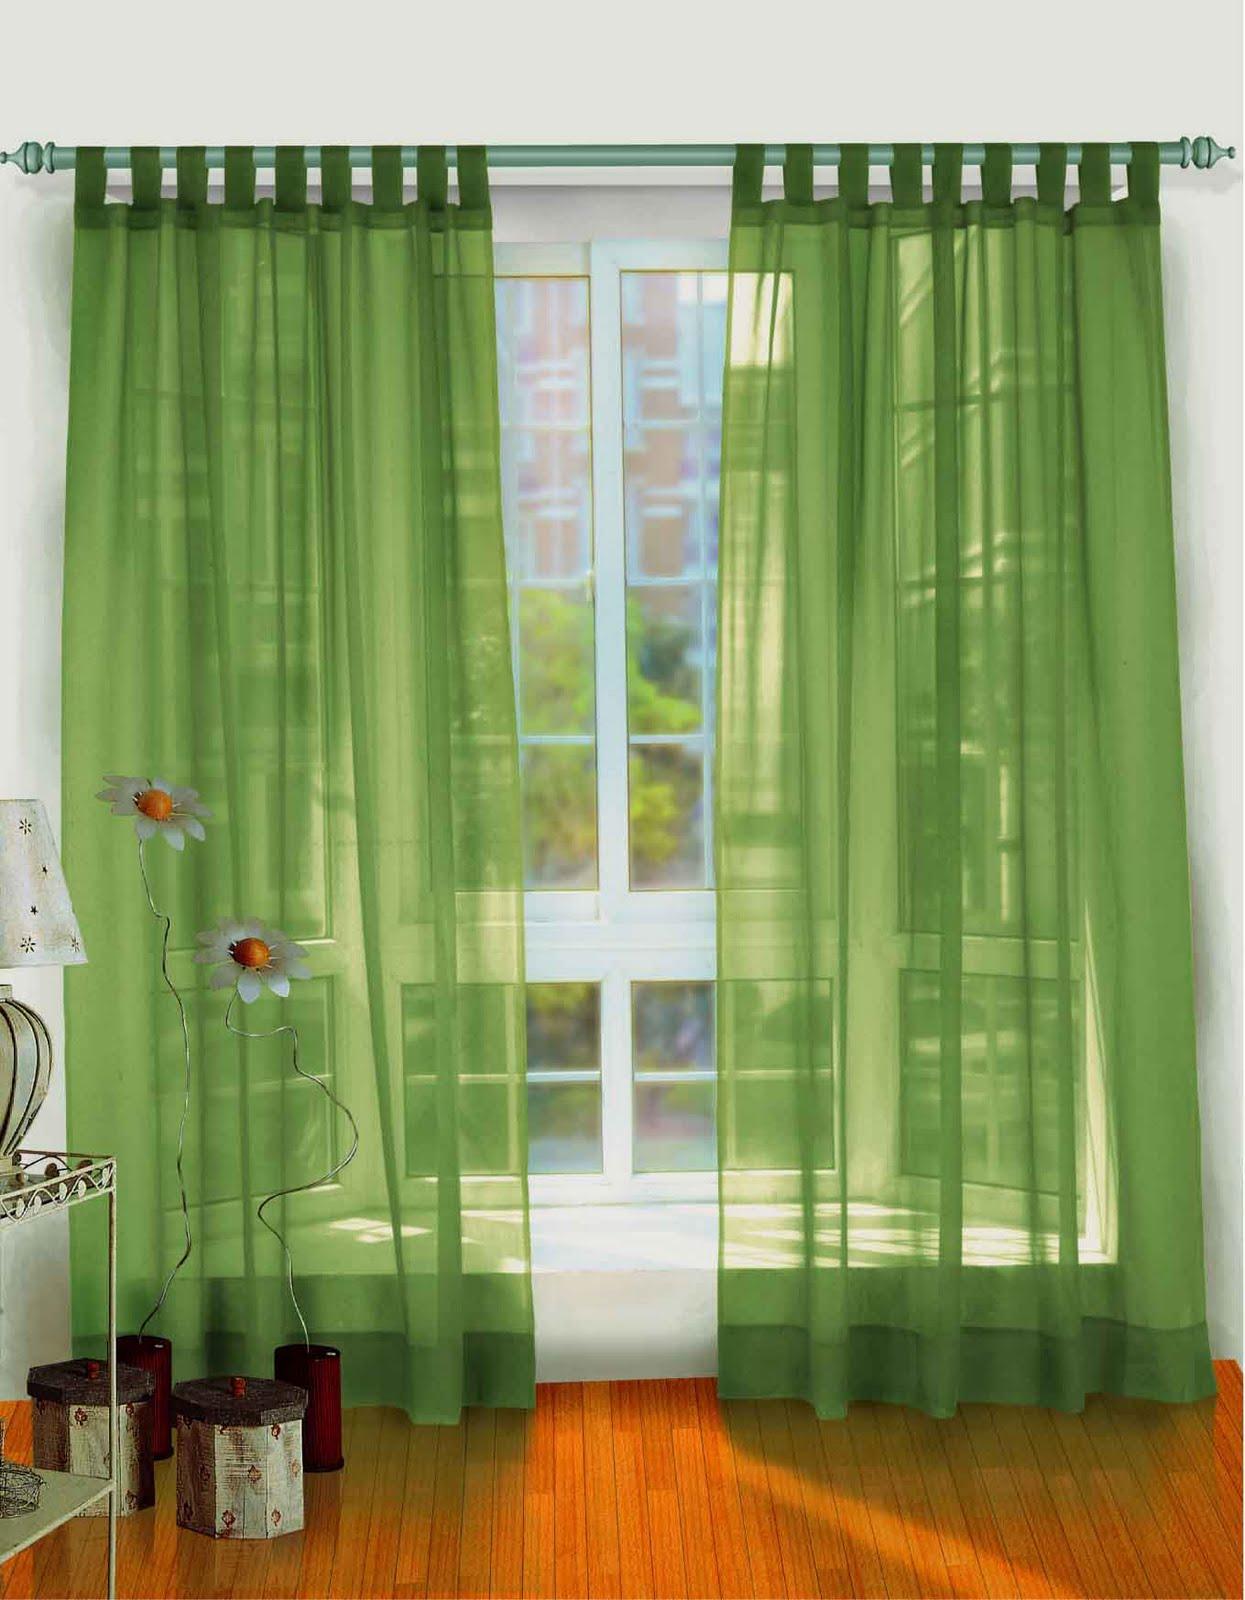 Modern Furniture: Living room curtains ideas 2011 on Living Room Curtains Ideas  id=80731